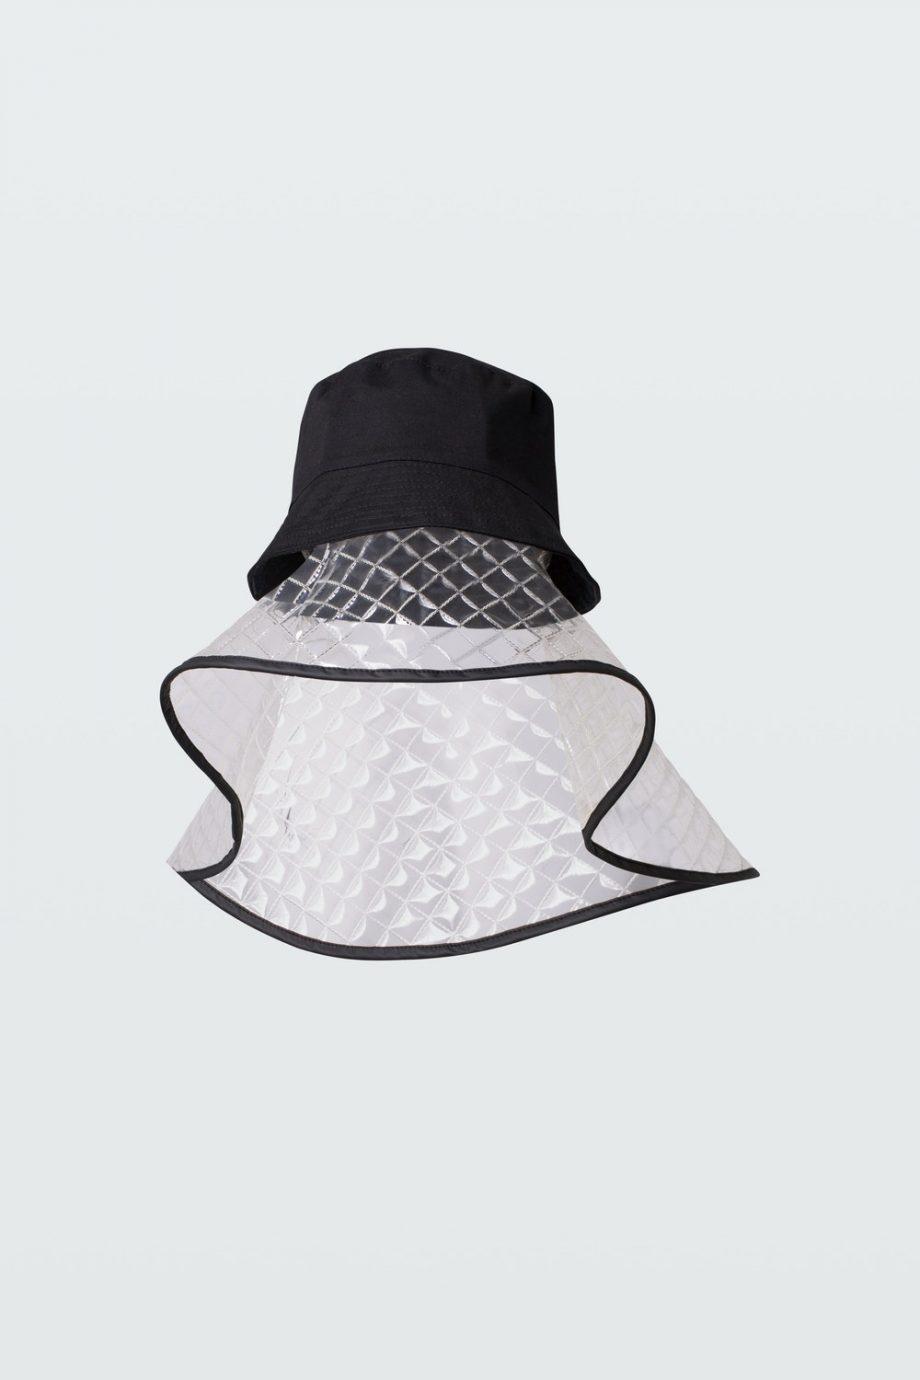 multi-colour-small-accessories-dorothee-schumacher-205-151001-001-os-4